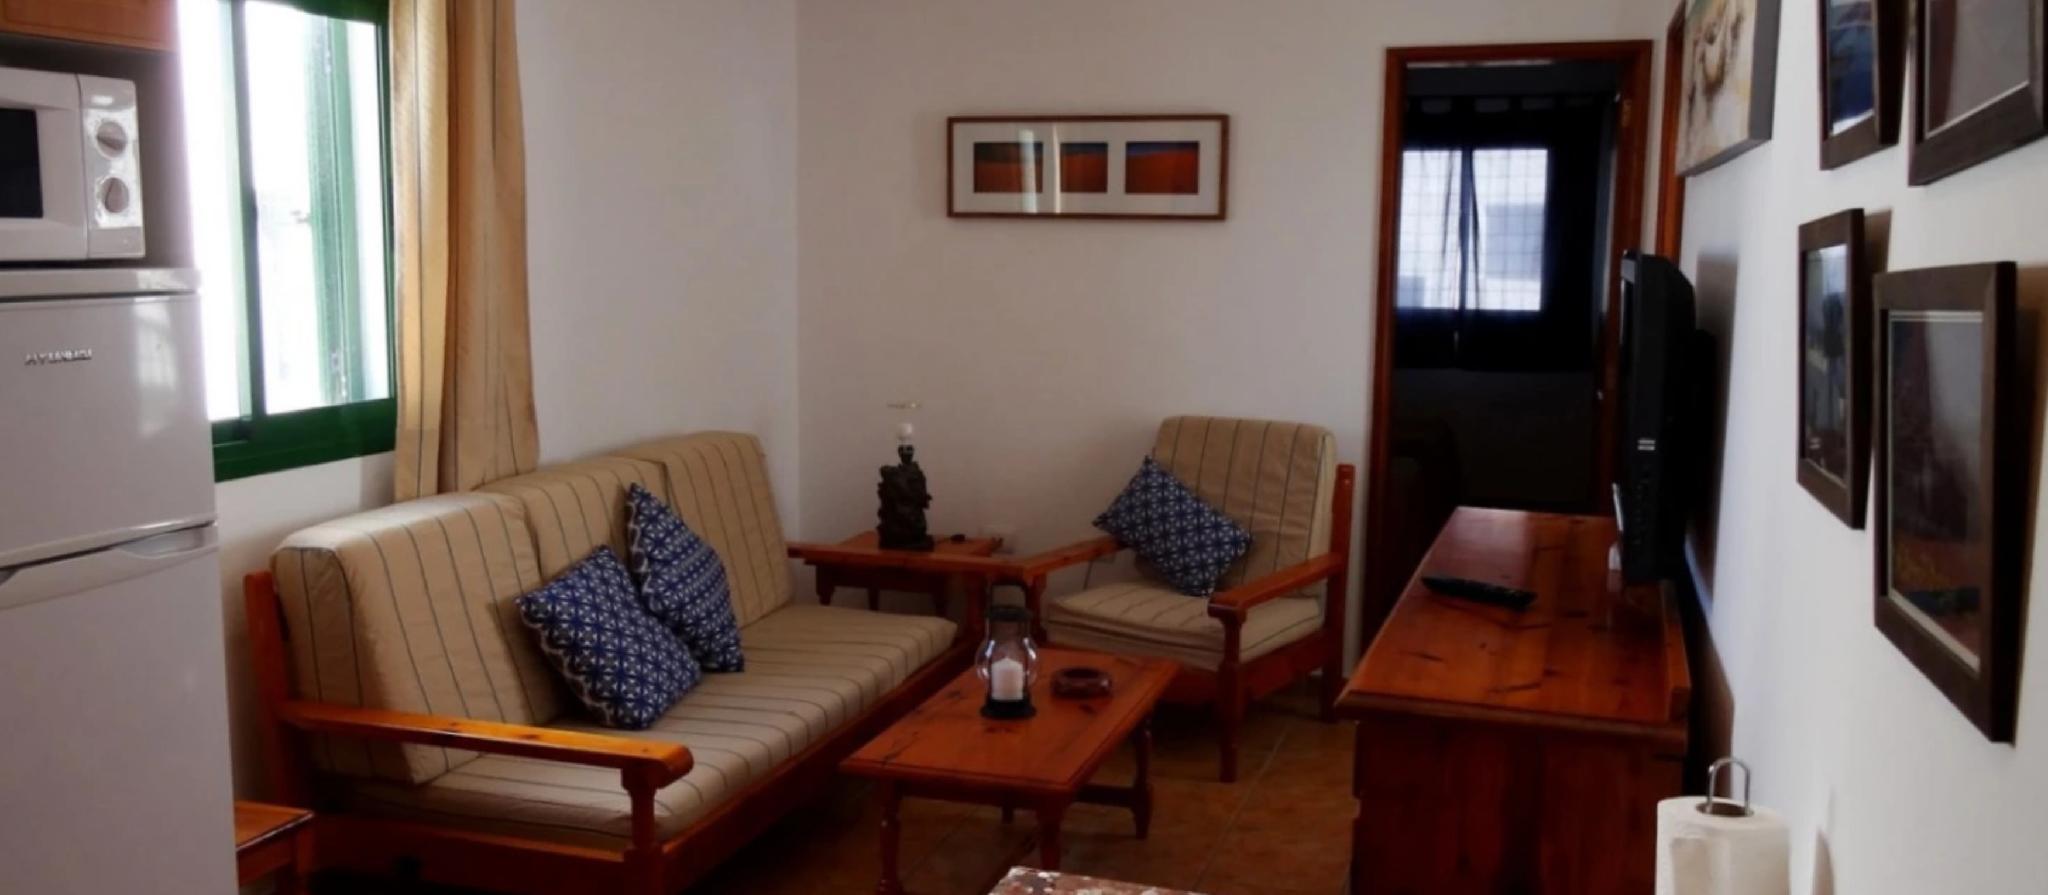 105762   Apartment In Caleta De Famara